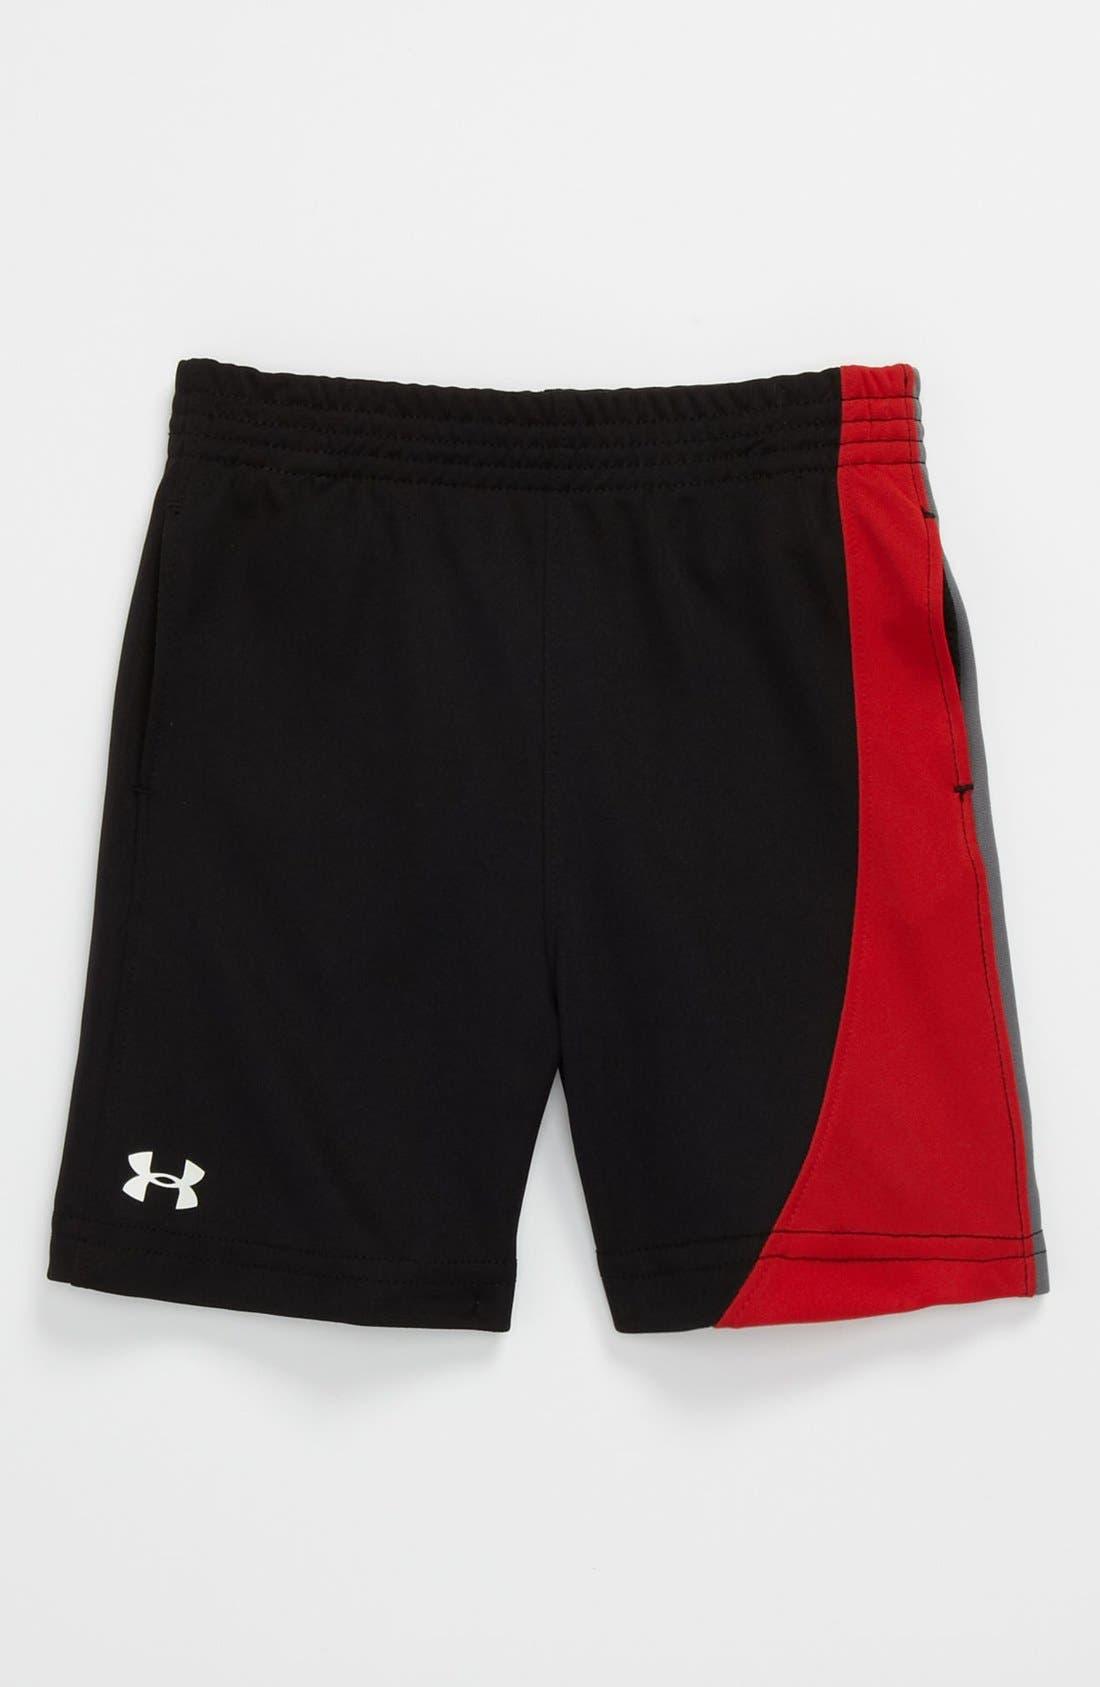 Alternate Image 1 Selected - Under Armour 'Flip' Shorts (Toddler)